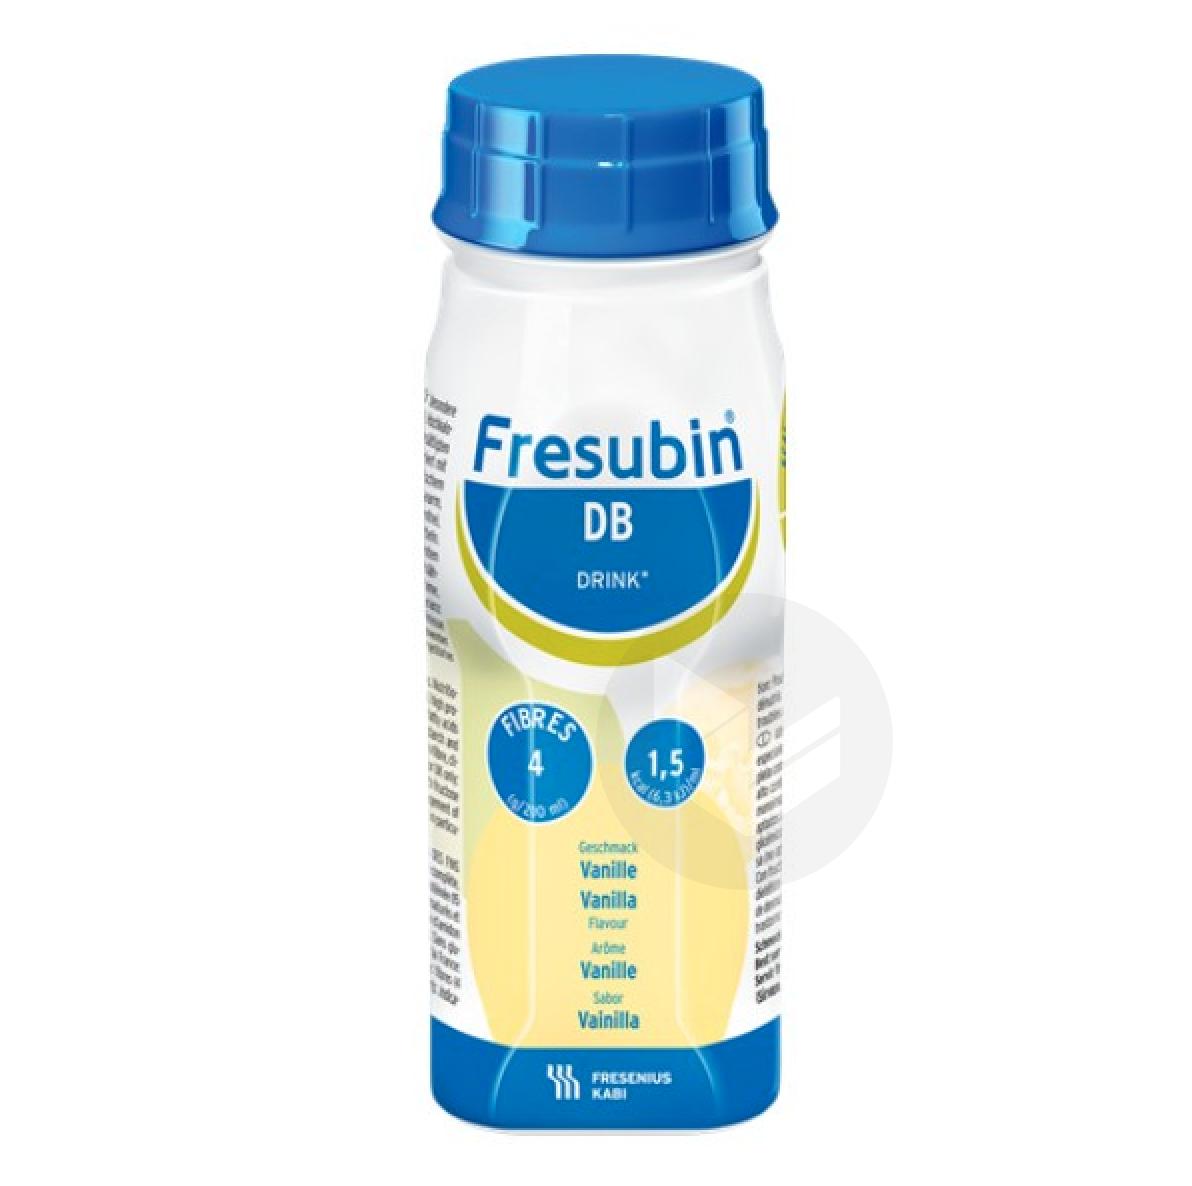 FRESUBIN DB DRINK Nutriment vanille 4Bouteilles/200ml